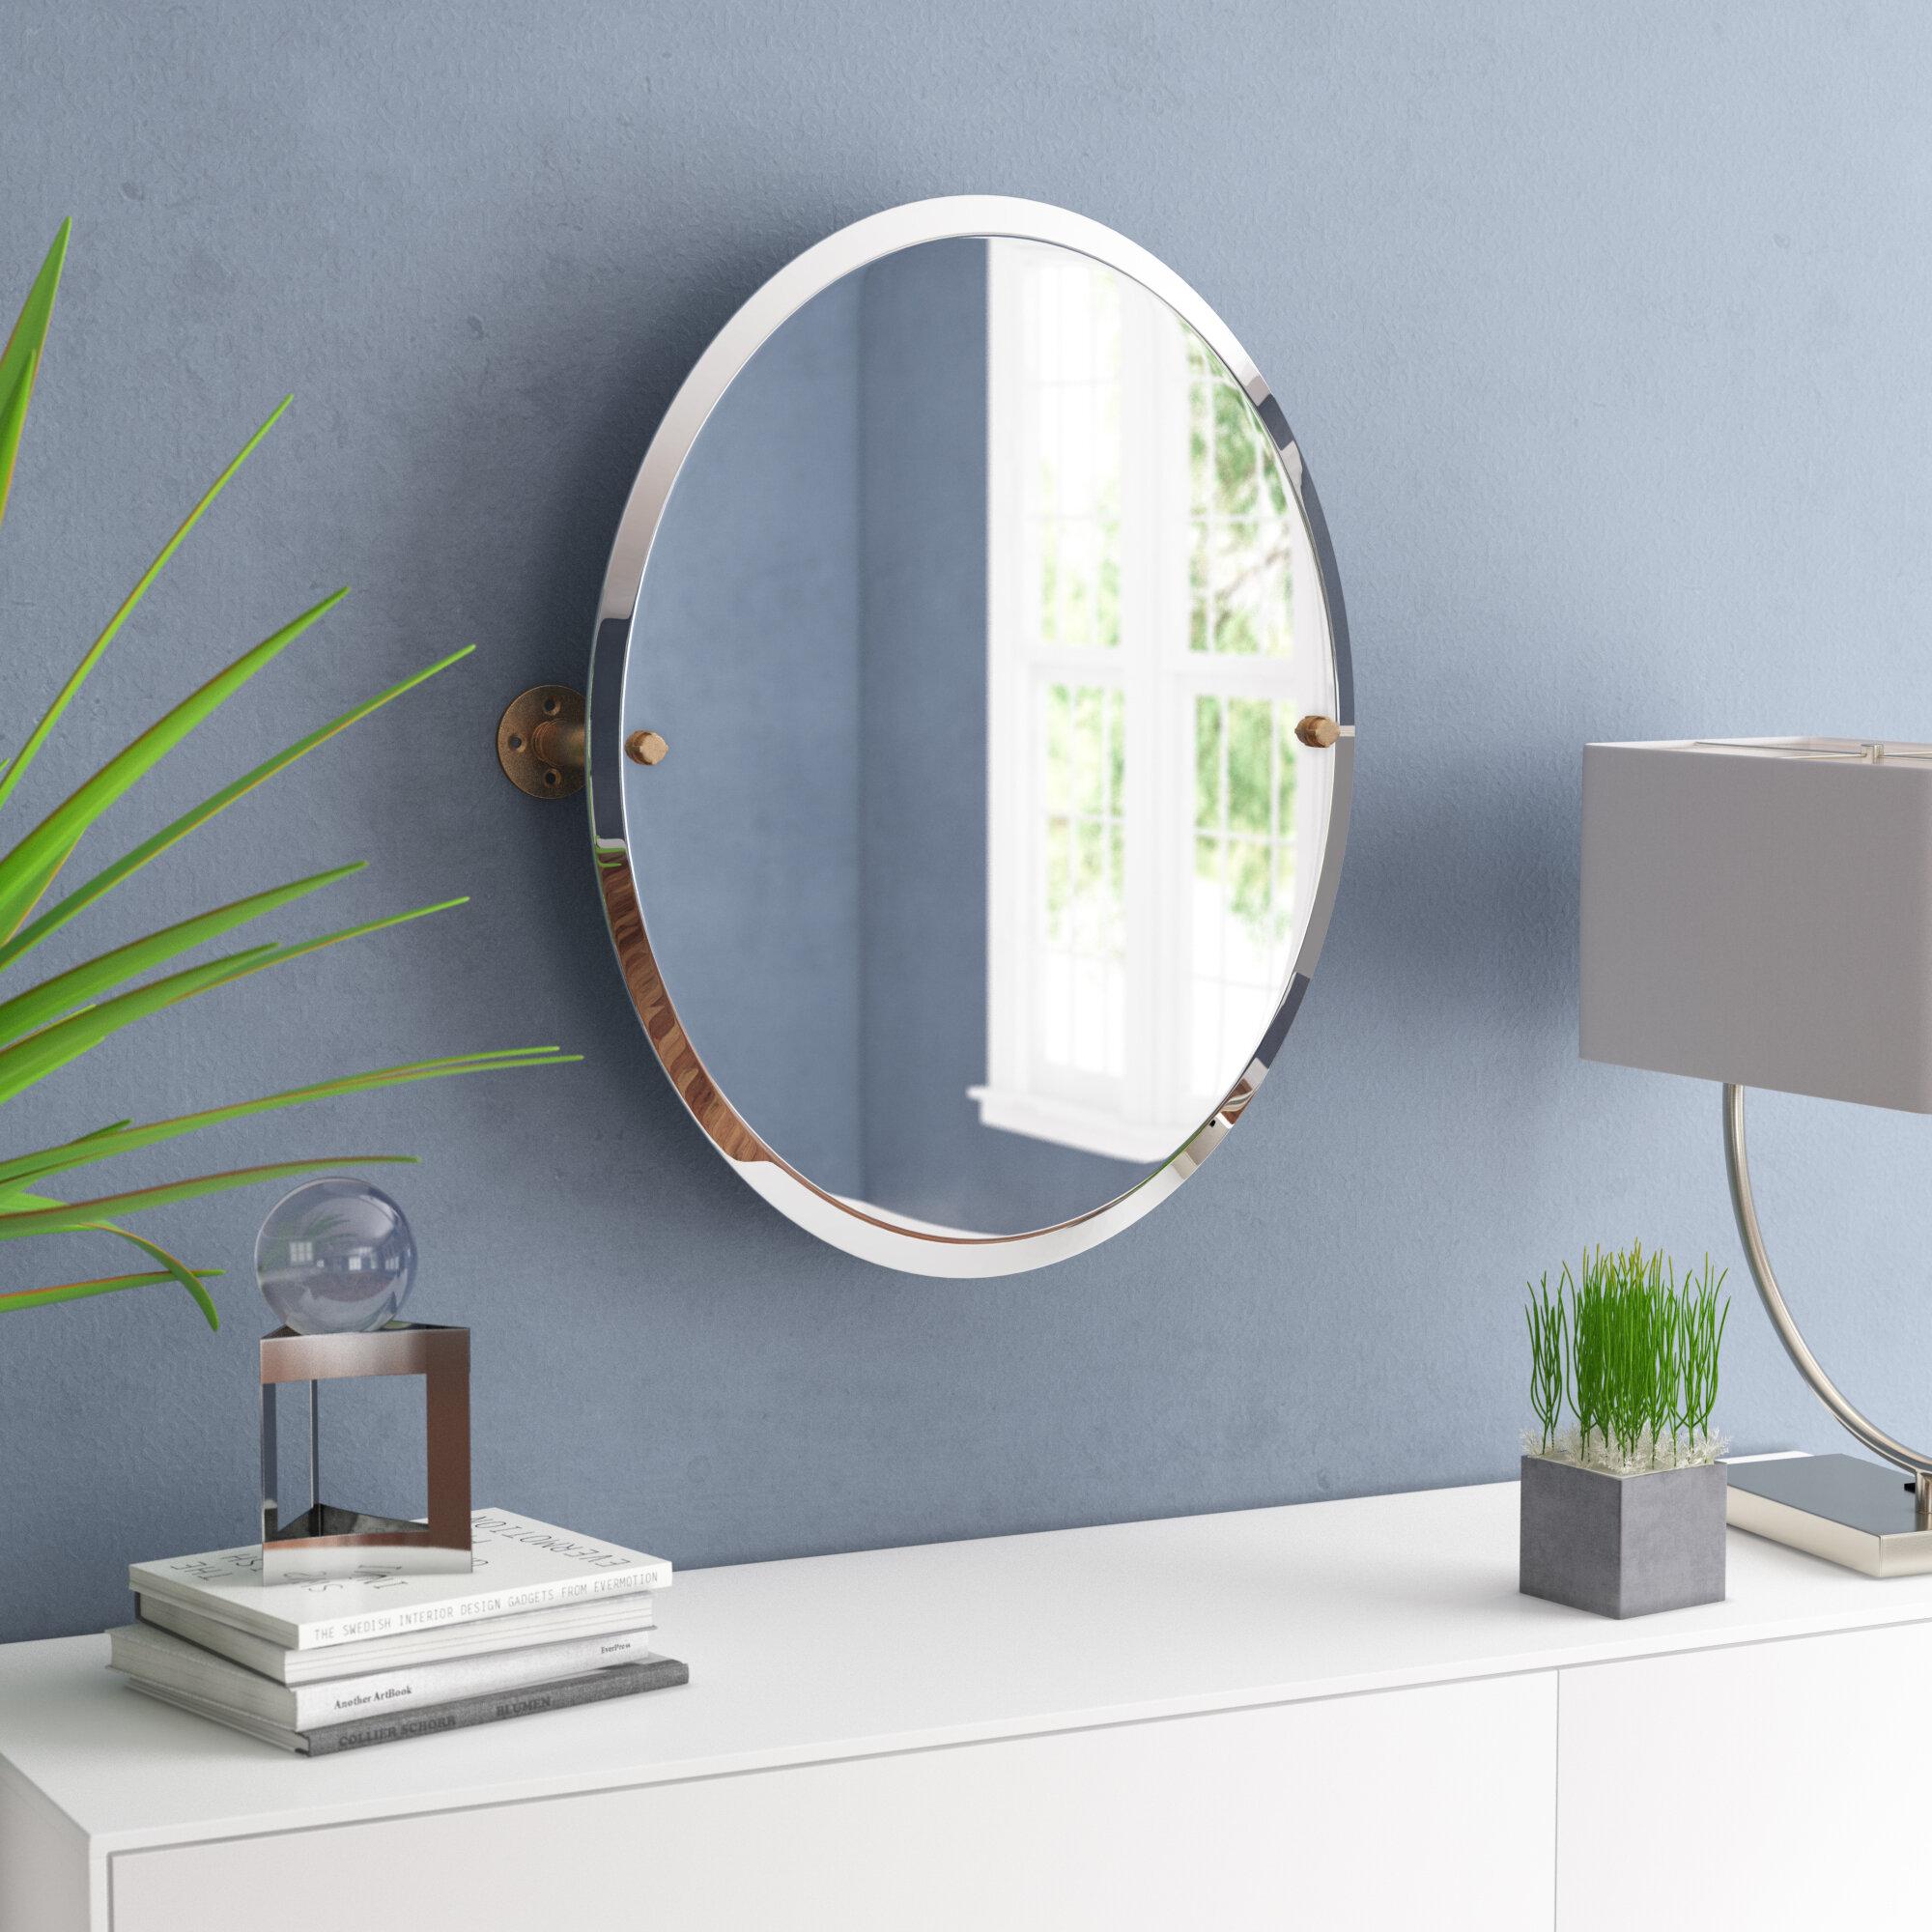 Bayer Frameless Oval Bathroom / Vanity Mirror